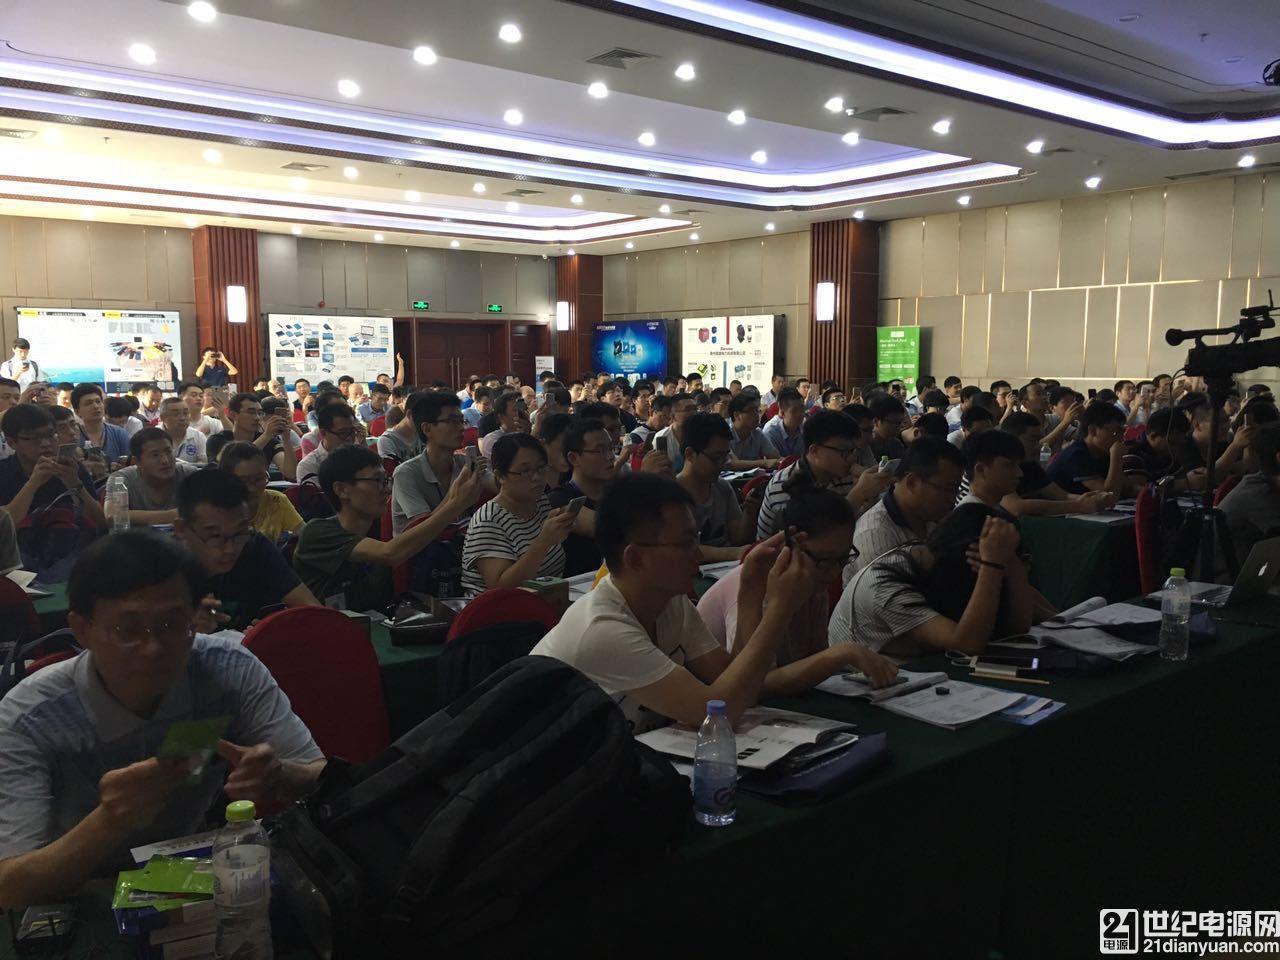 http://cdn12.21dianyuan.com/attachment/forum/201708/08/150220wzlmtjzmwdd8mjob.jpg.thumb.jpg